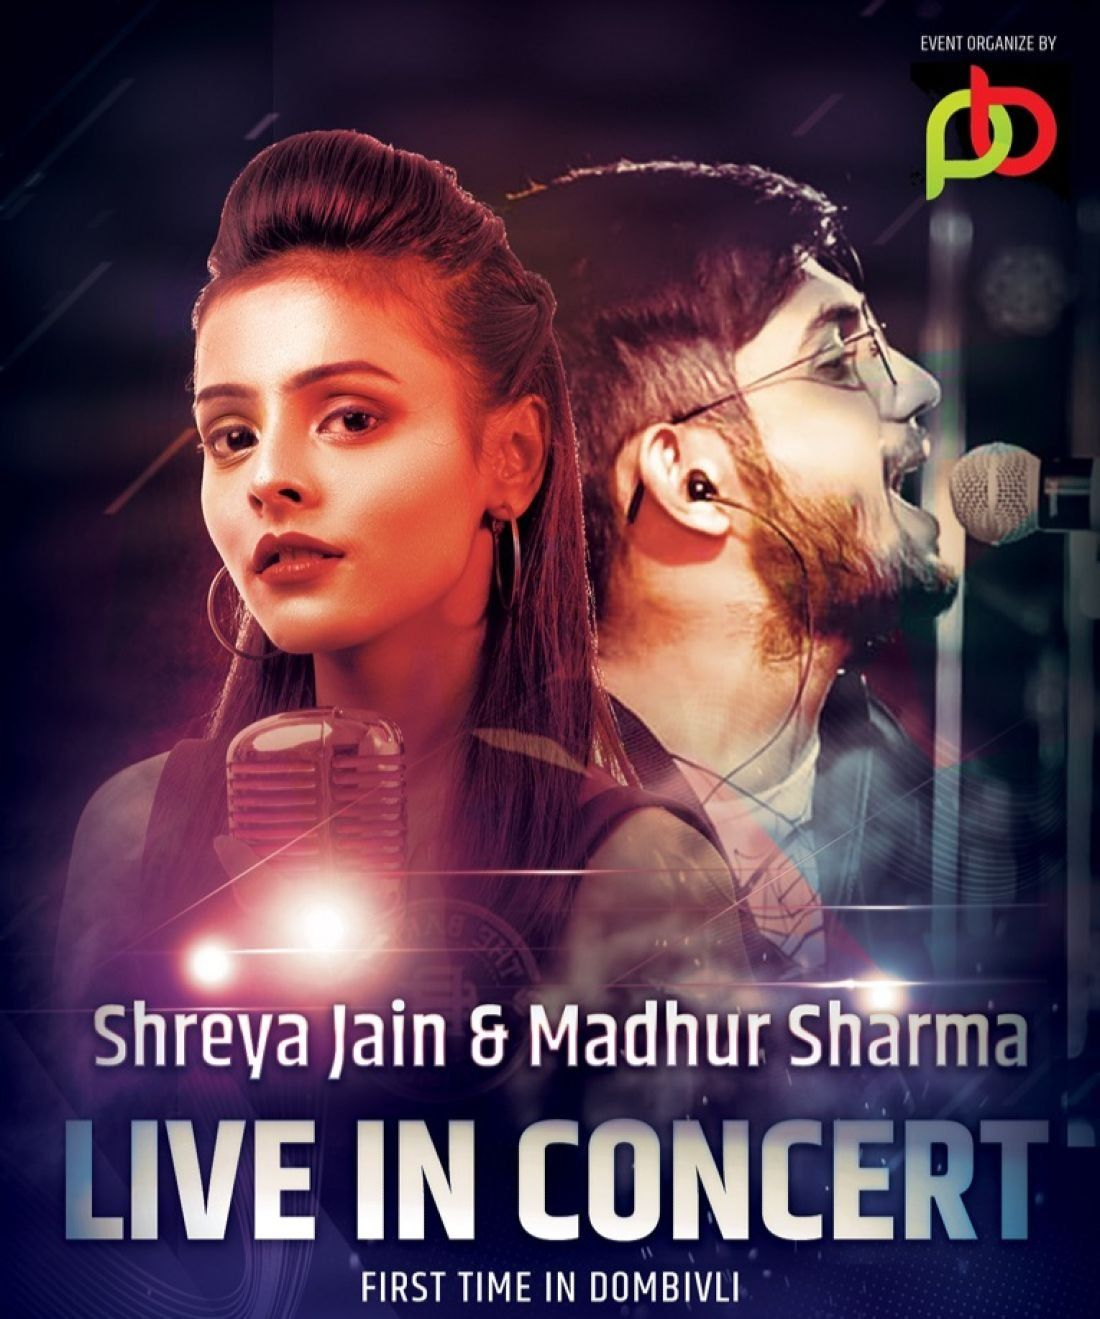 Shreya Jain and Madhur Sharma live in concert Dombivli